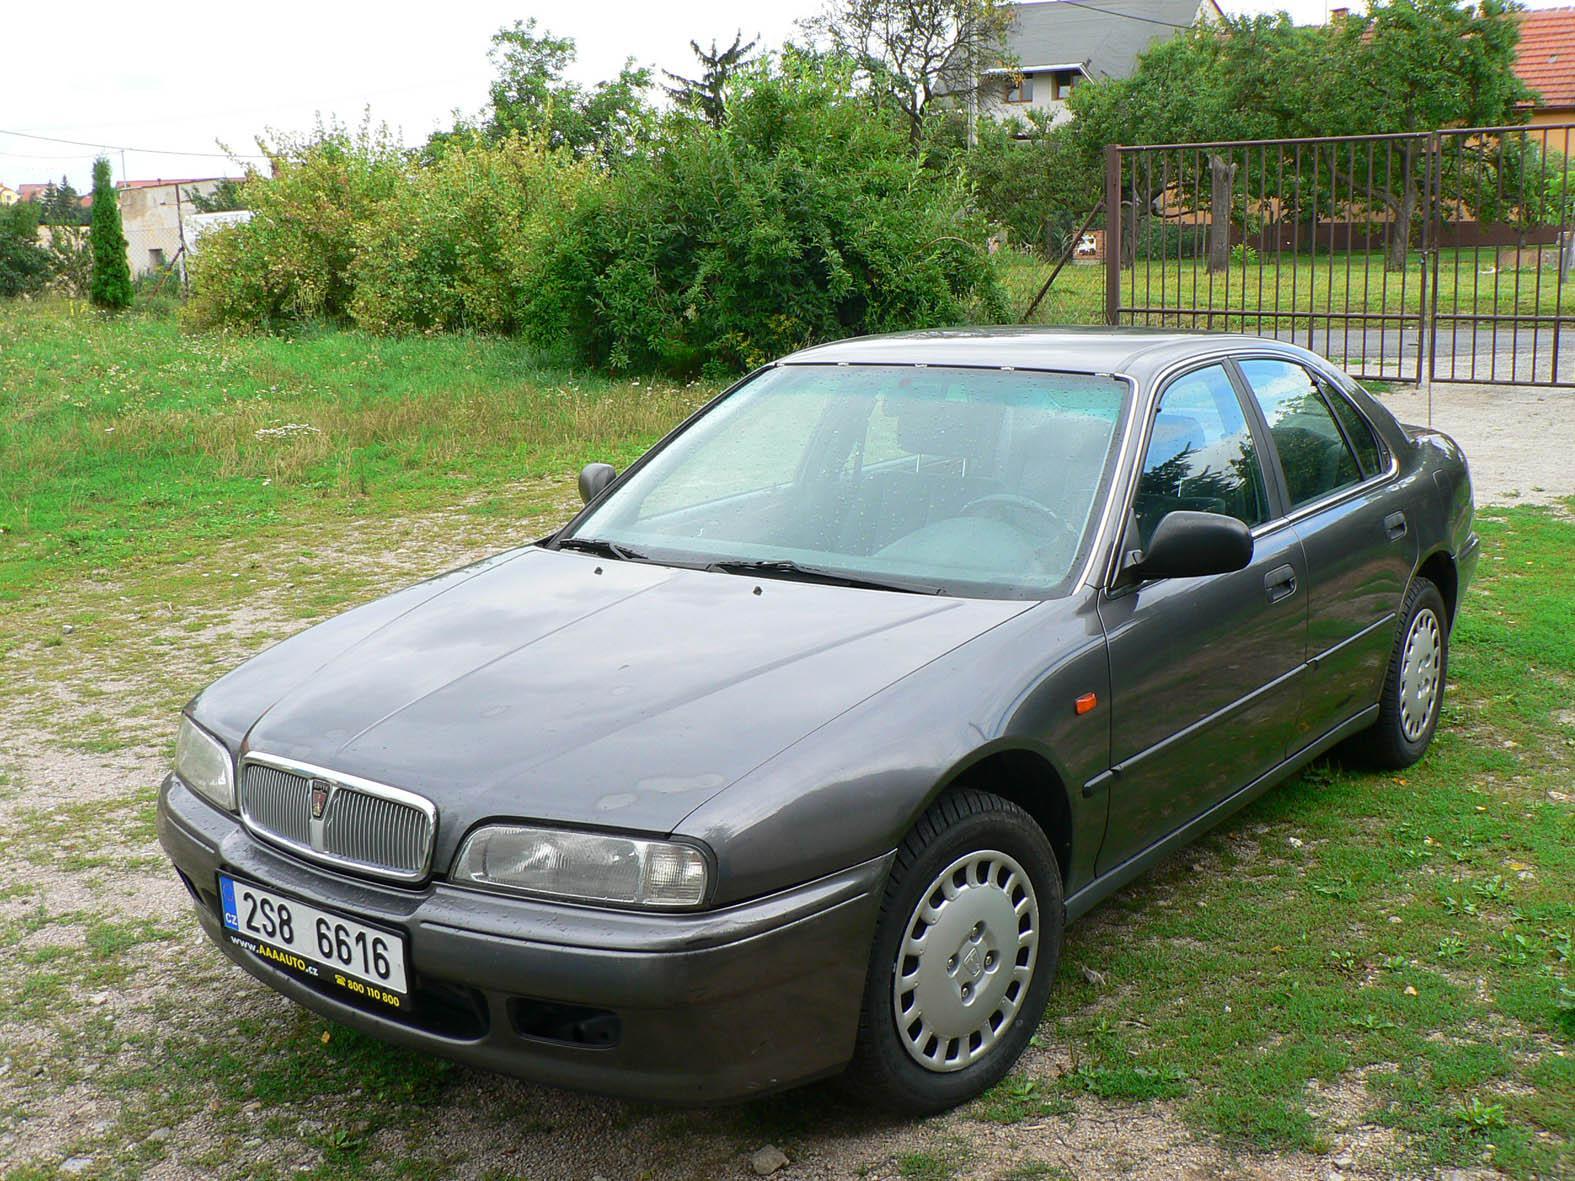 1995 rover 600 620 sdi 2 0  122 cui  diesel 77 kw 210 nm 1994 Rover 620 rover 620 si service manual